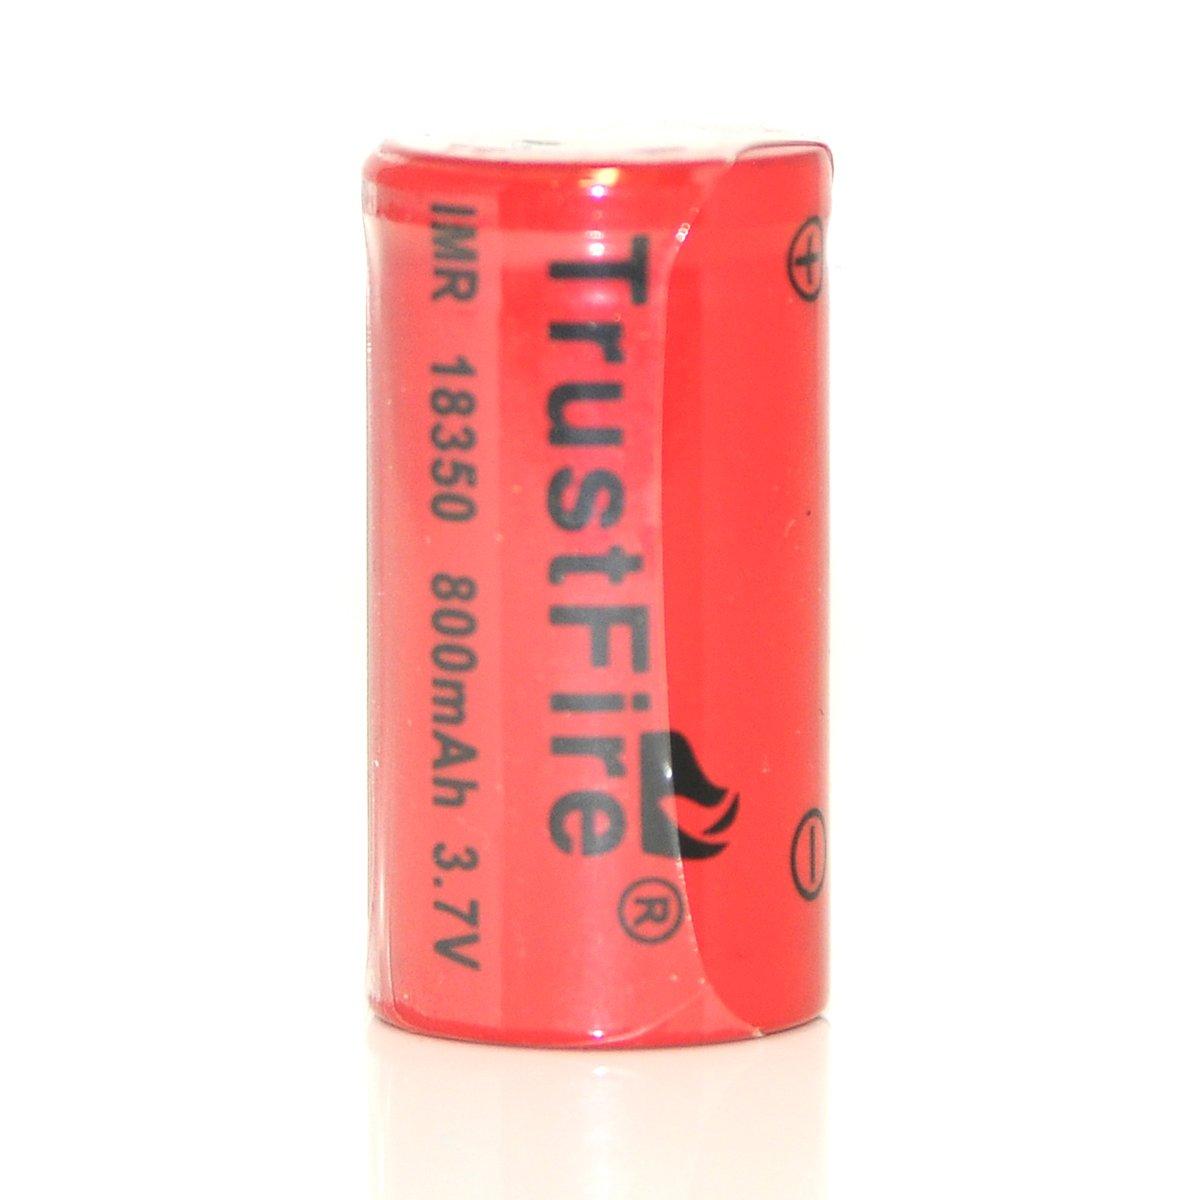 TrustFire 18350 800mAh Battery